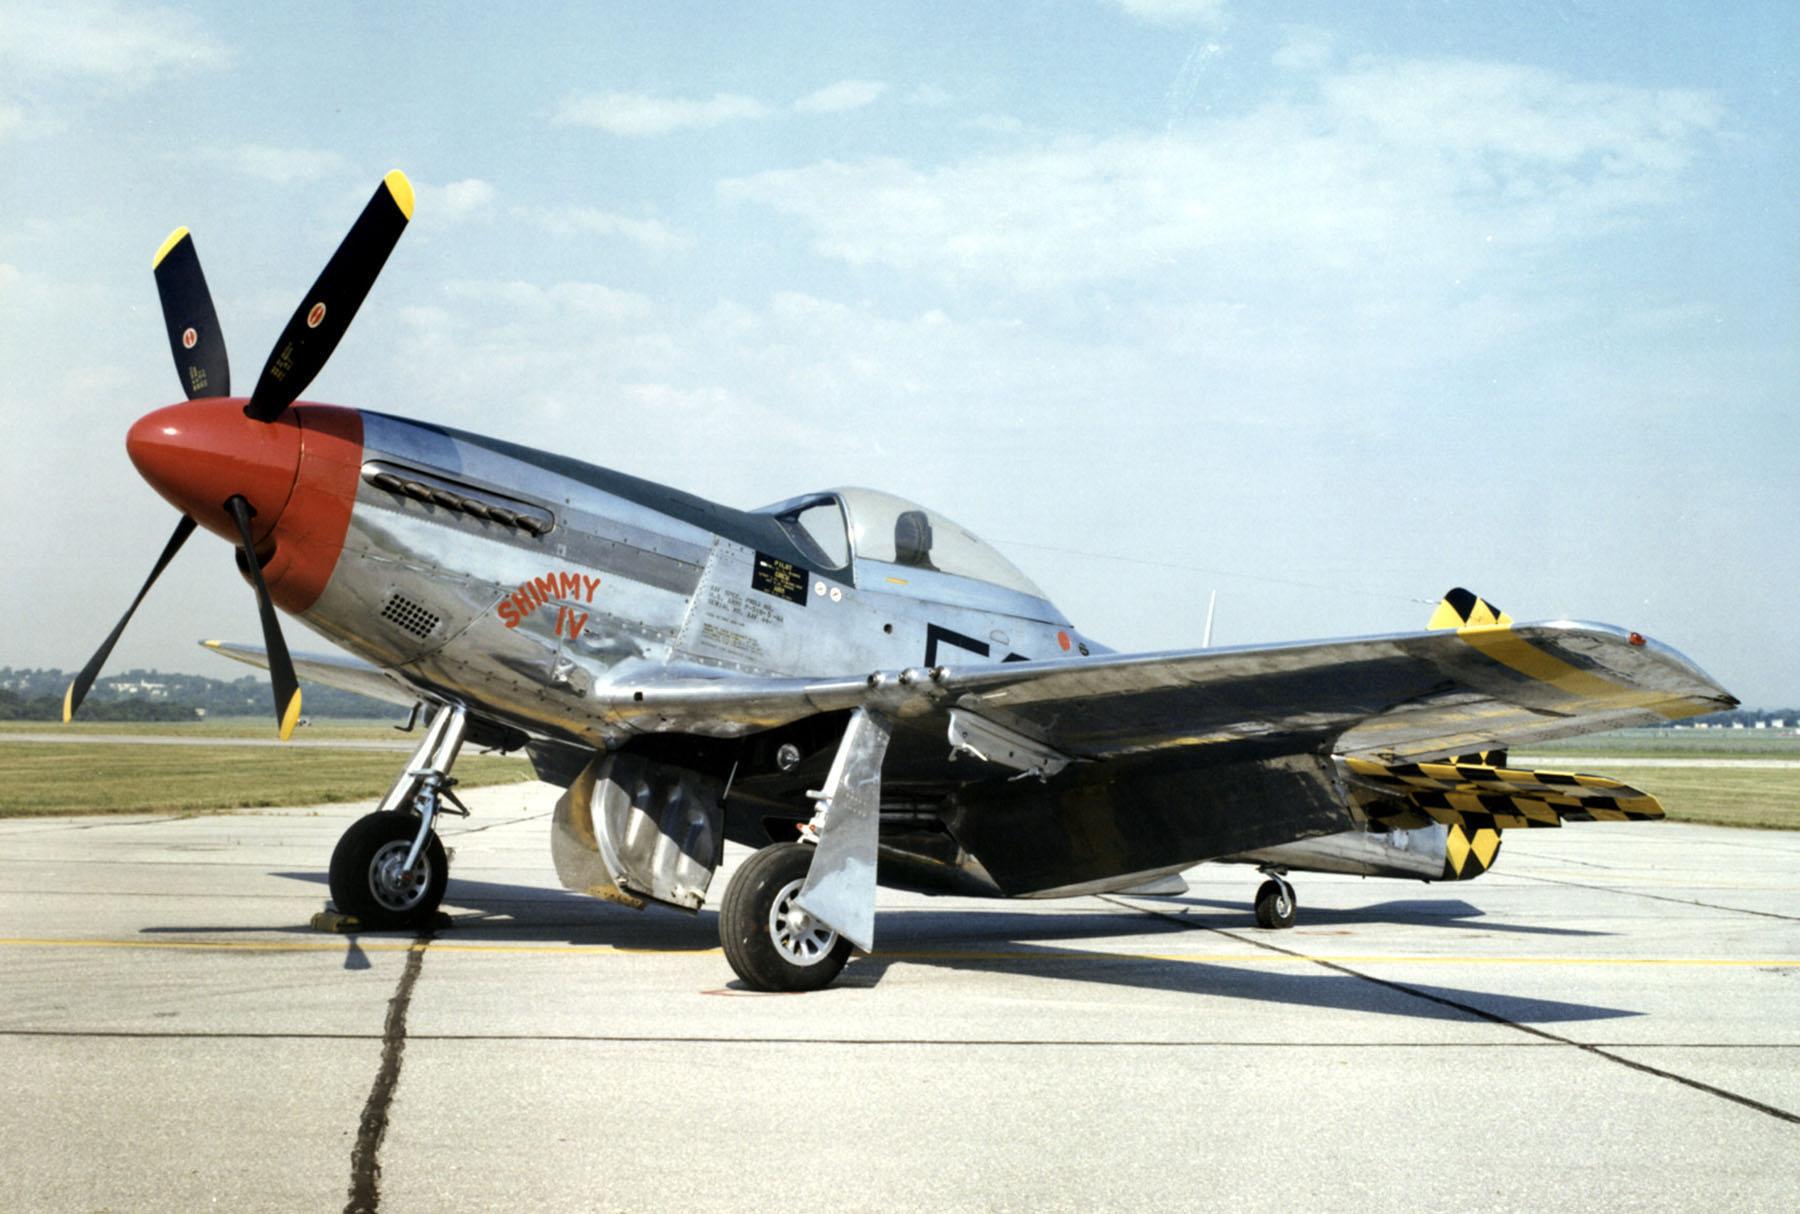 M Bel G Rtner p 51d mustang flyg modellbygge ifokus